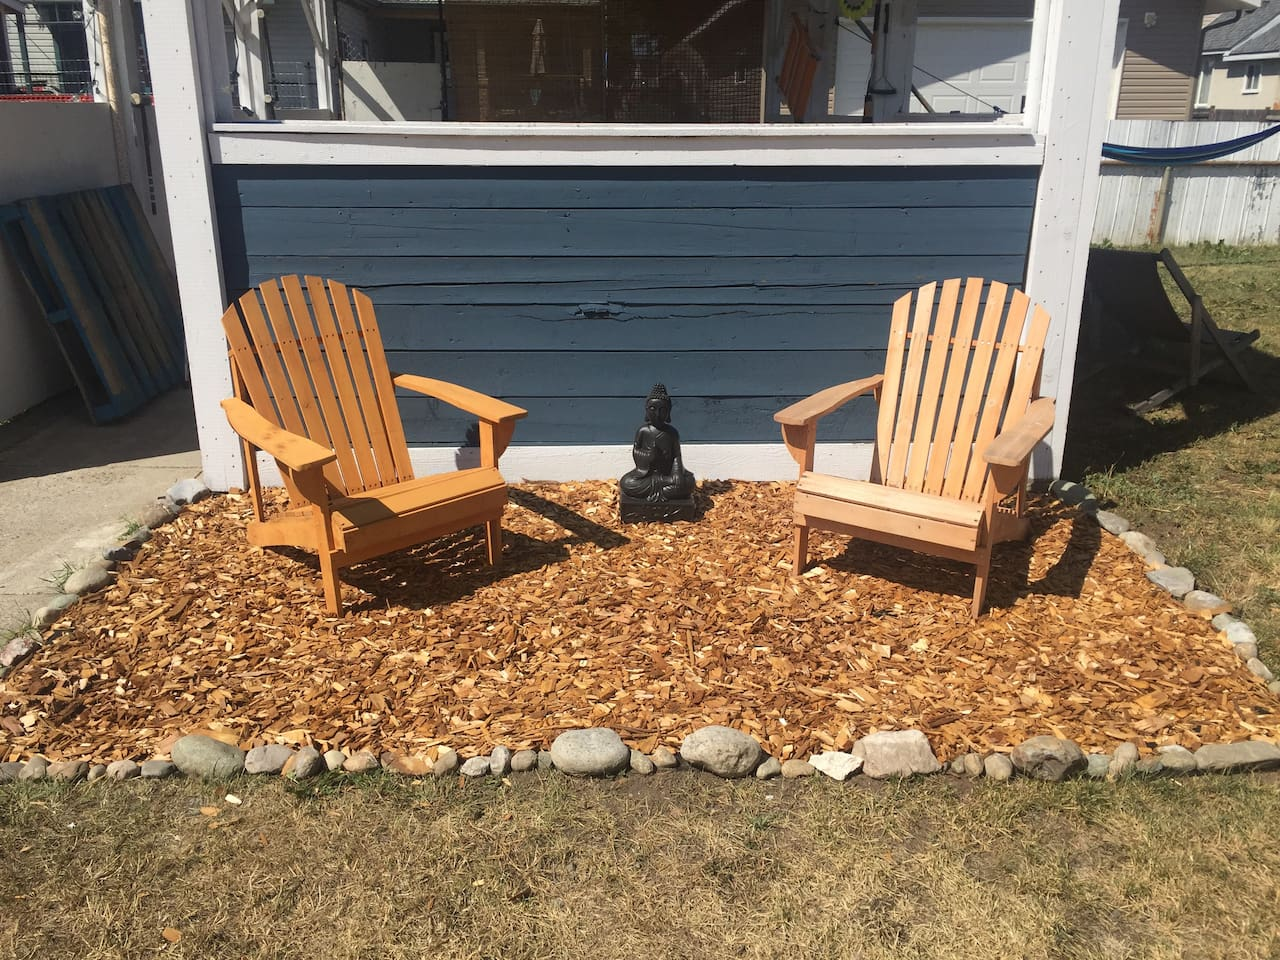 Zen garden for your morning coffee